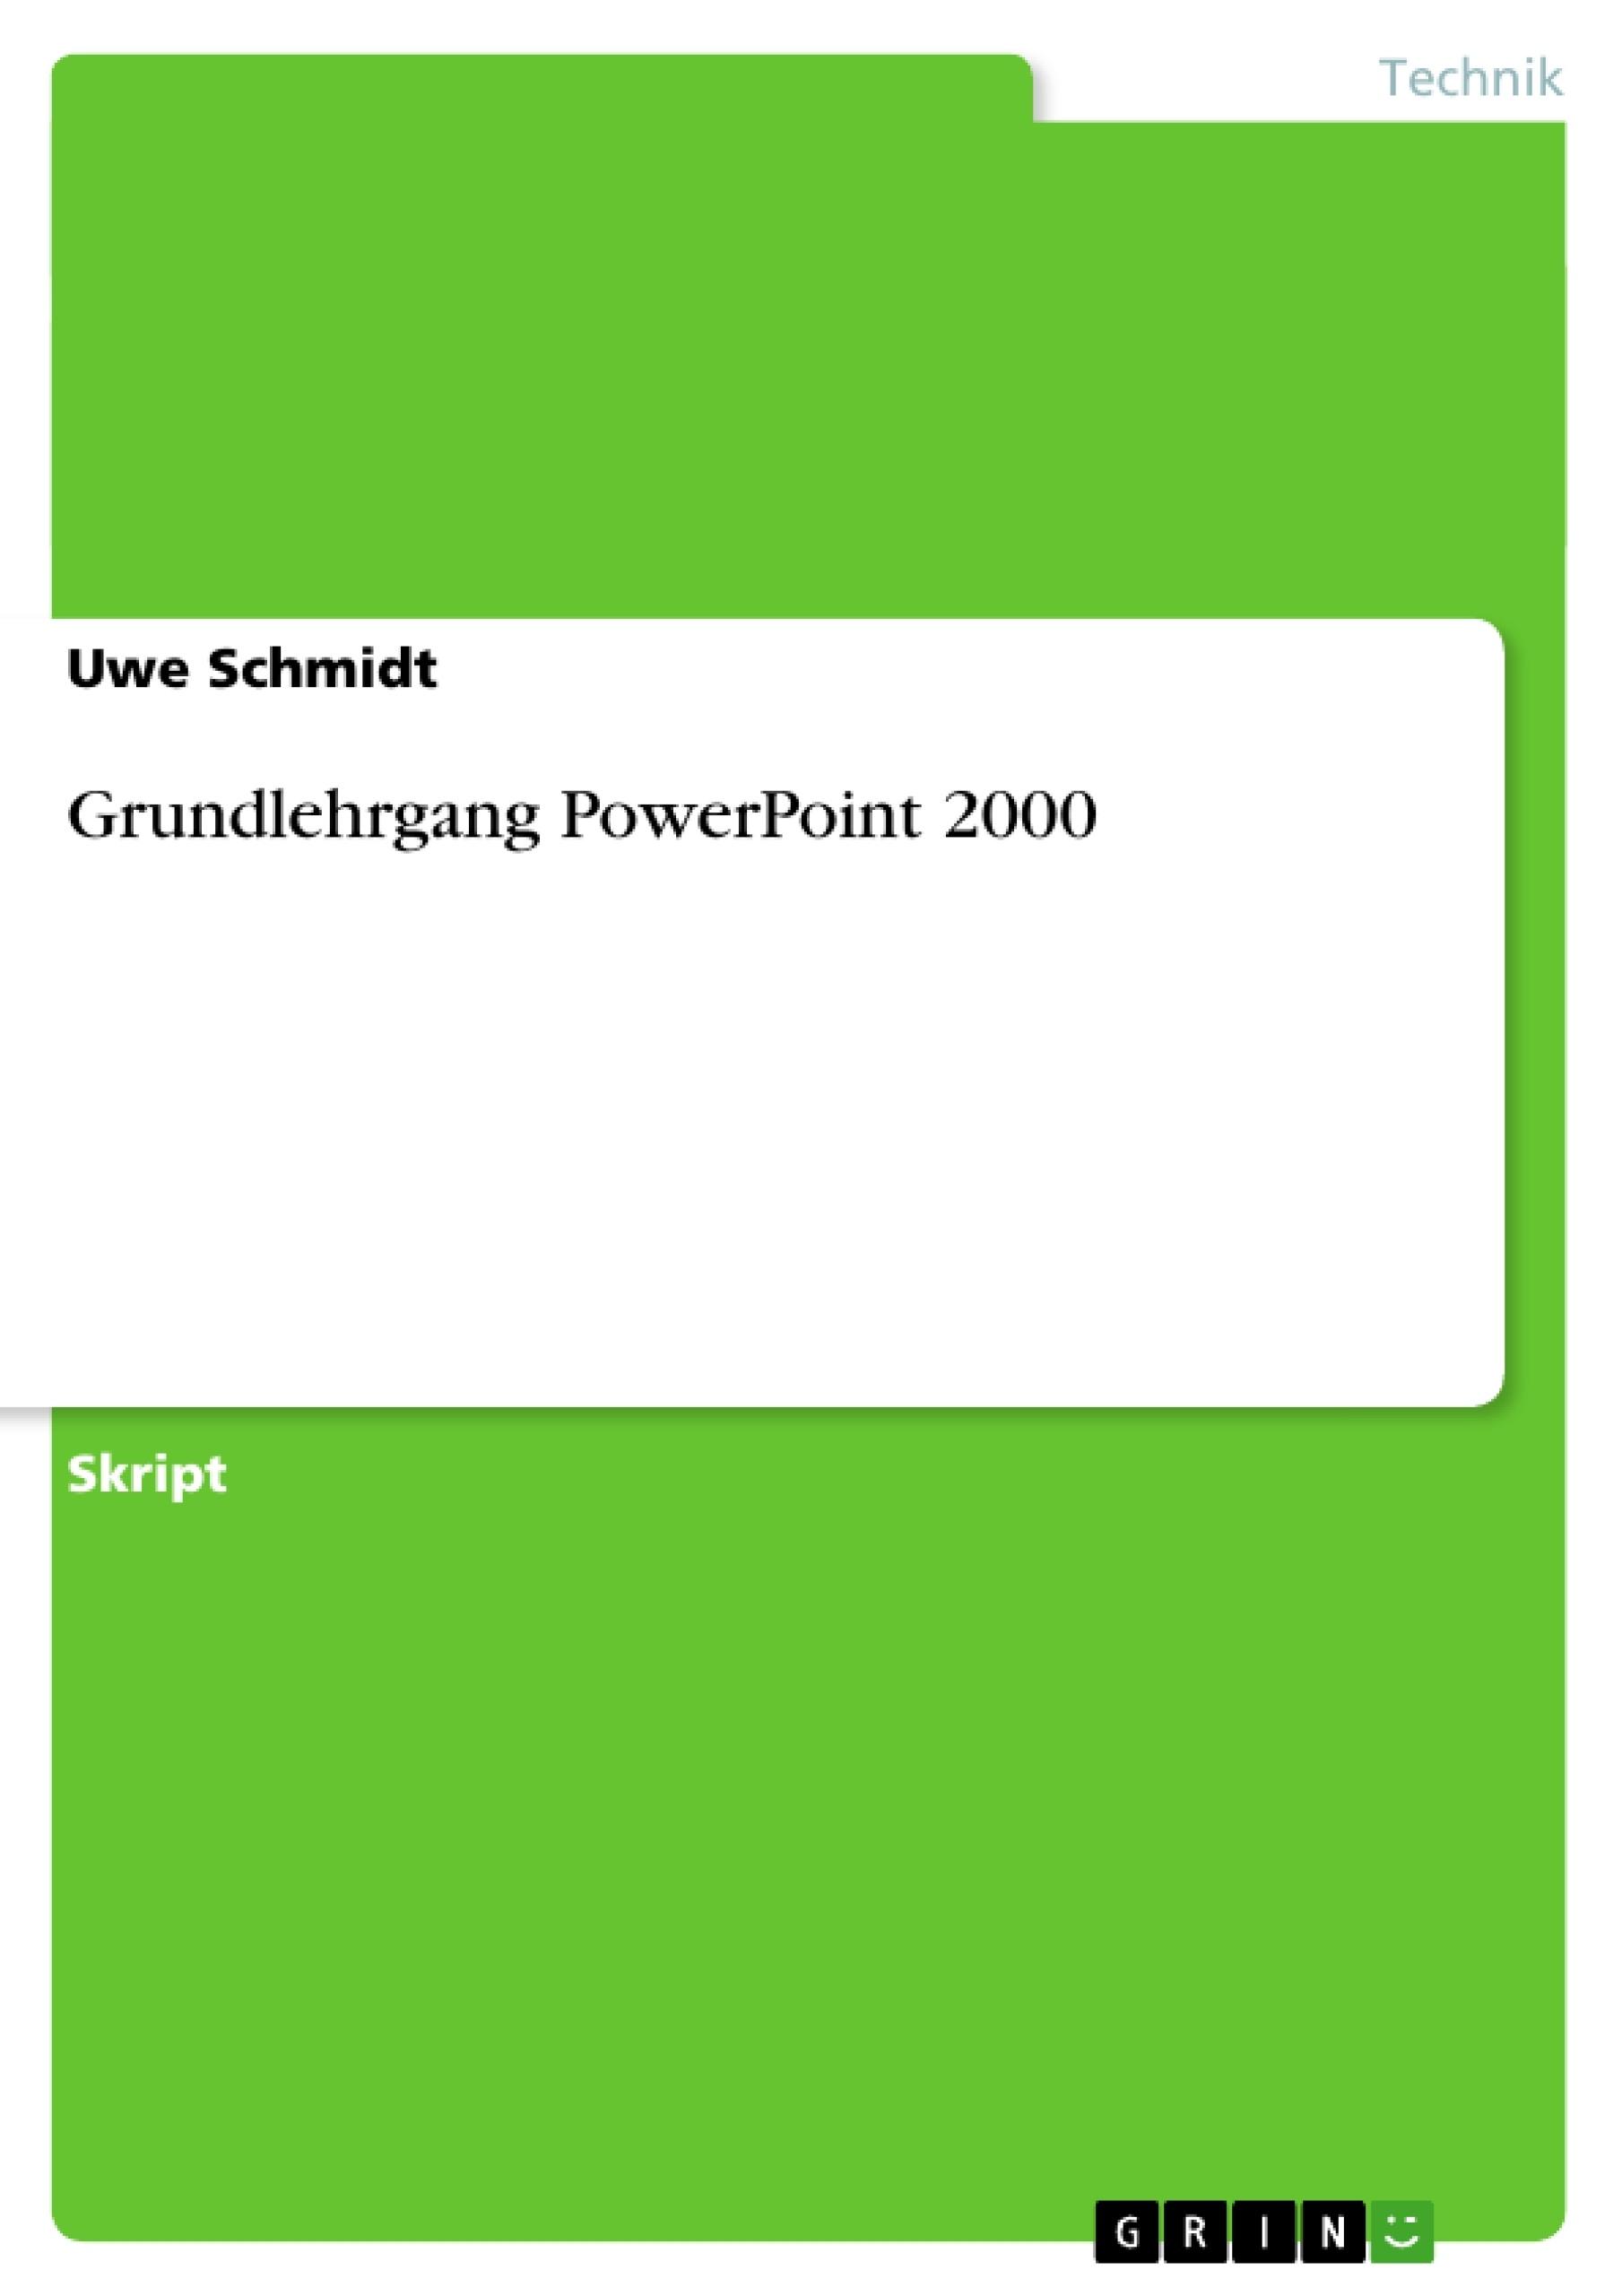 Titel: Grundlehrgang PowerPoint 2000